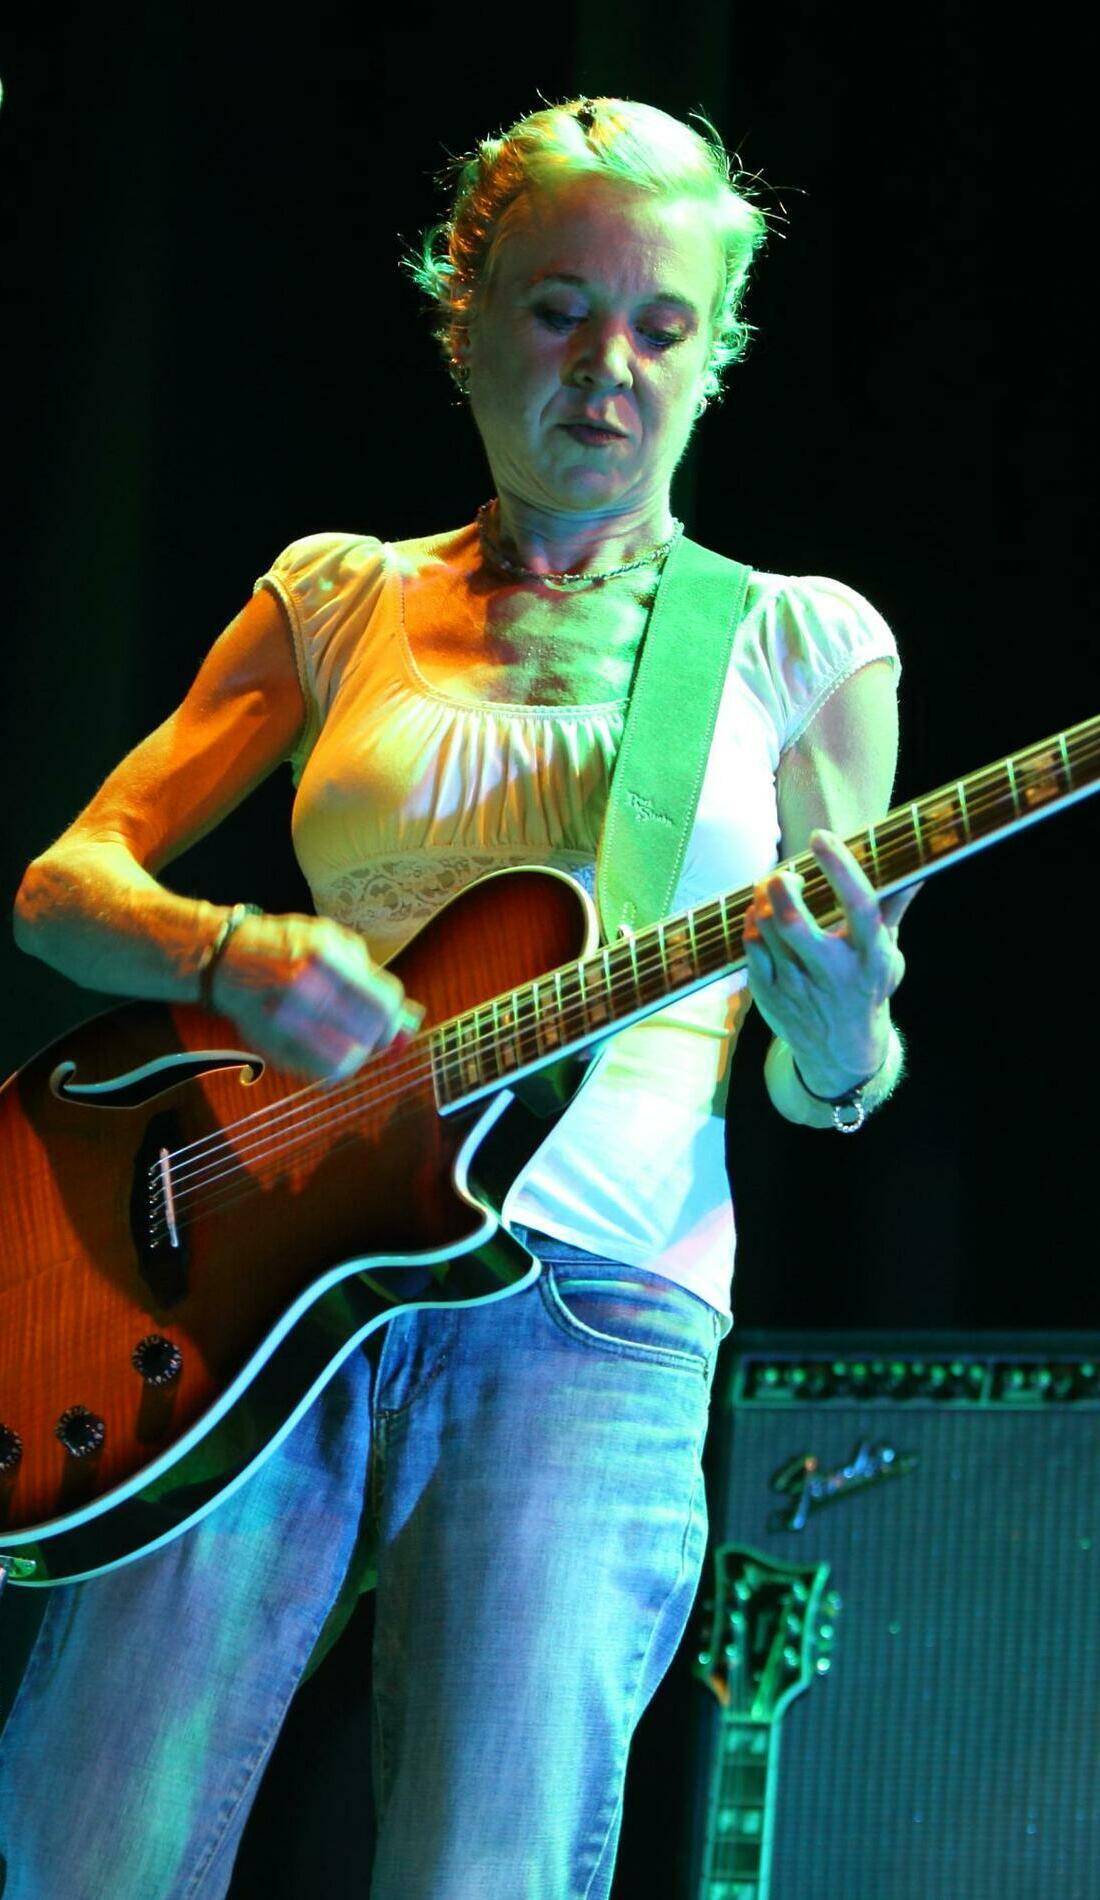 A Kristin Hersh live event